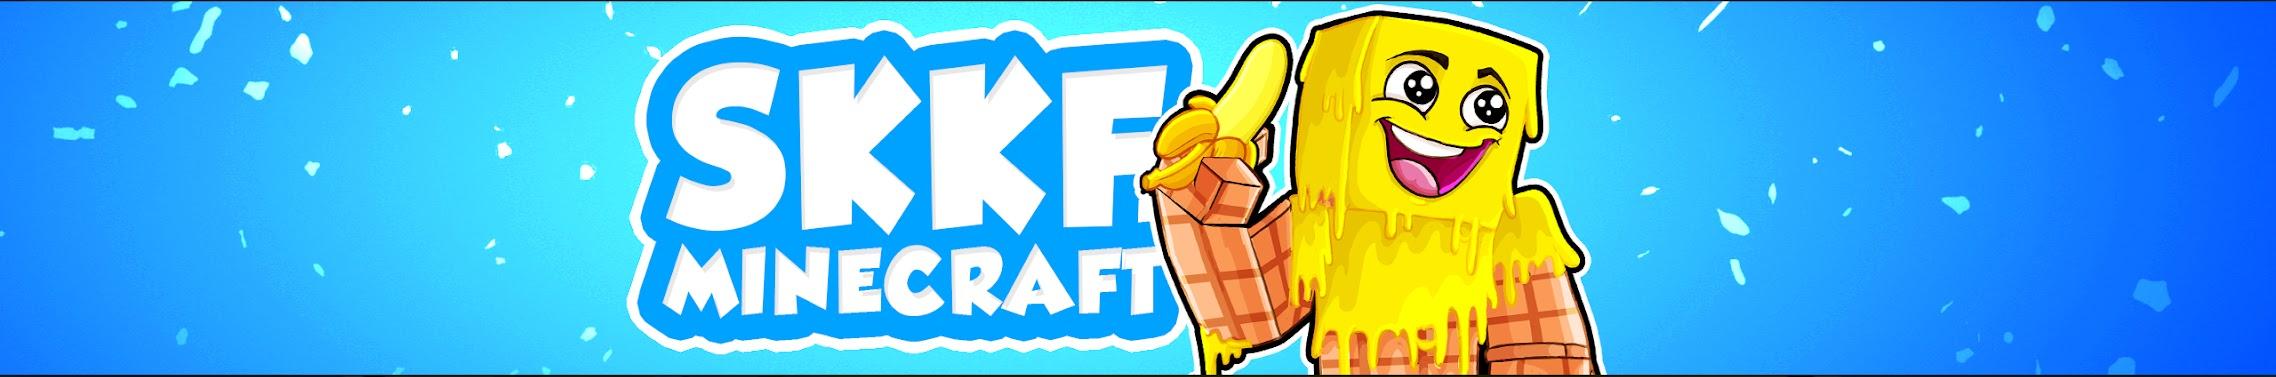 skkf minecraft